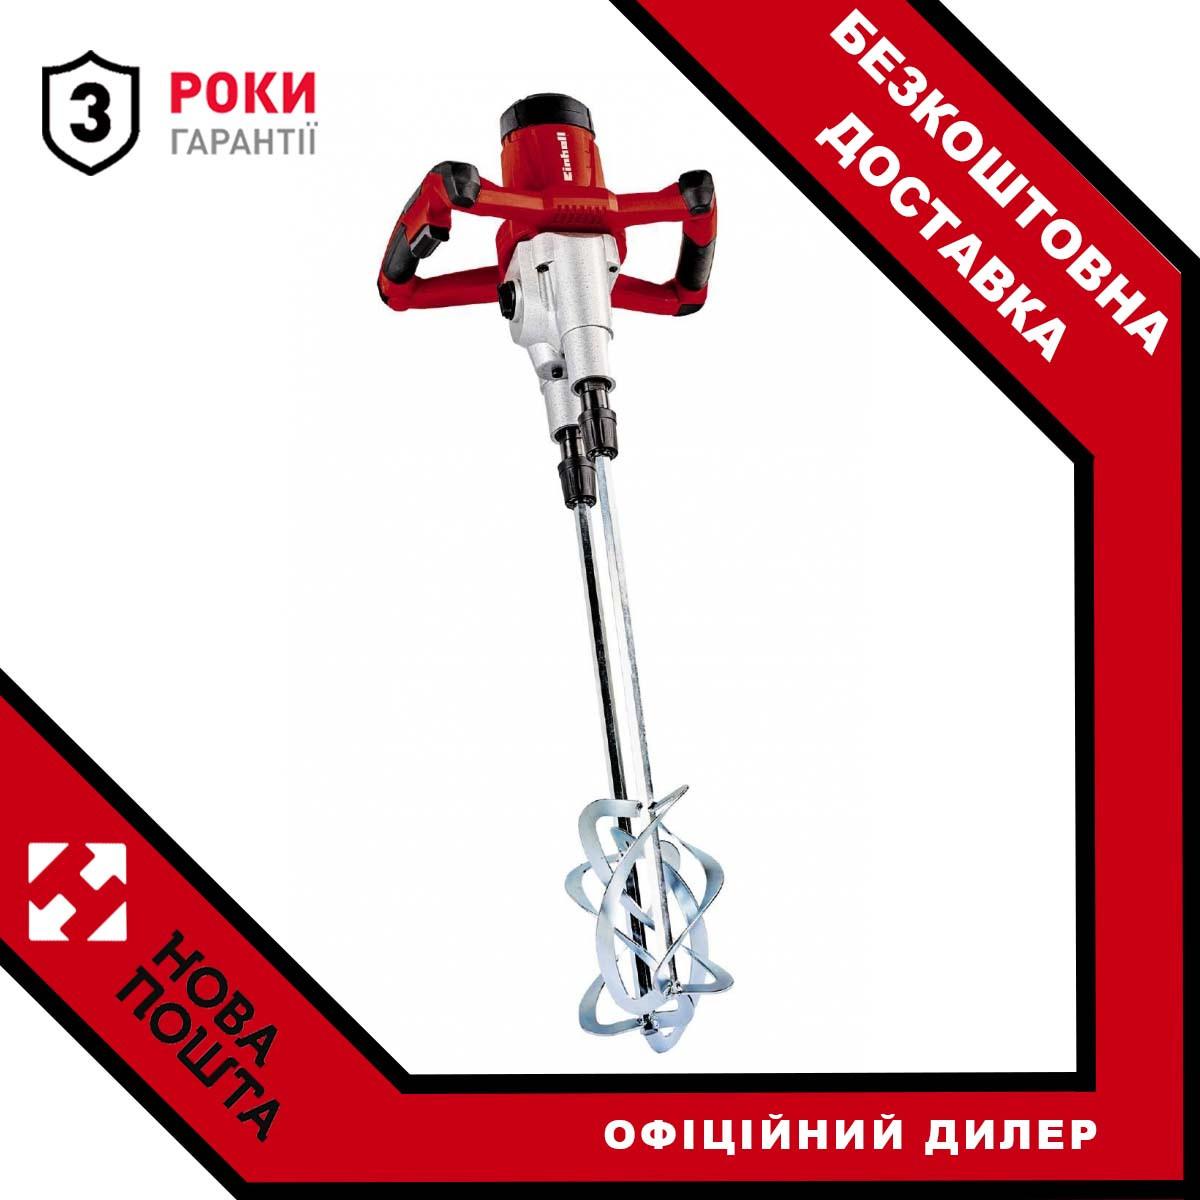 Миксер-мешалка Einhell TE-MX 1600-2 CE Twin New (4258561)